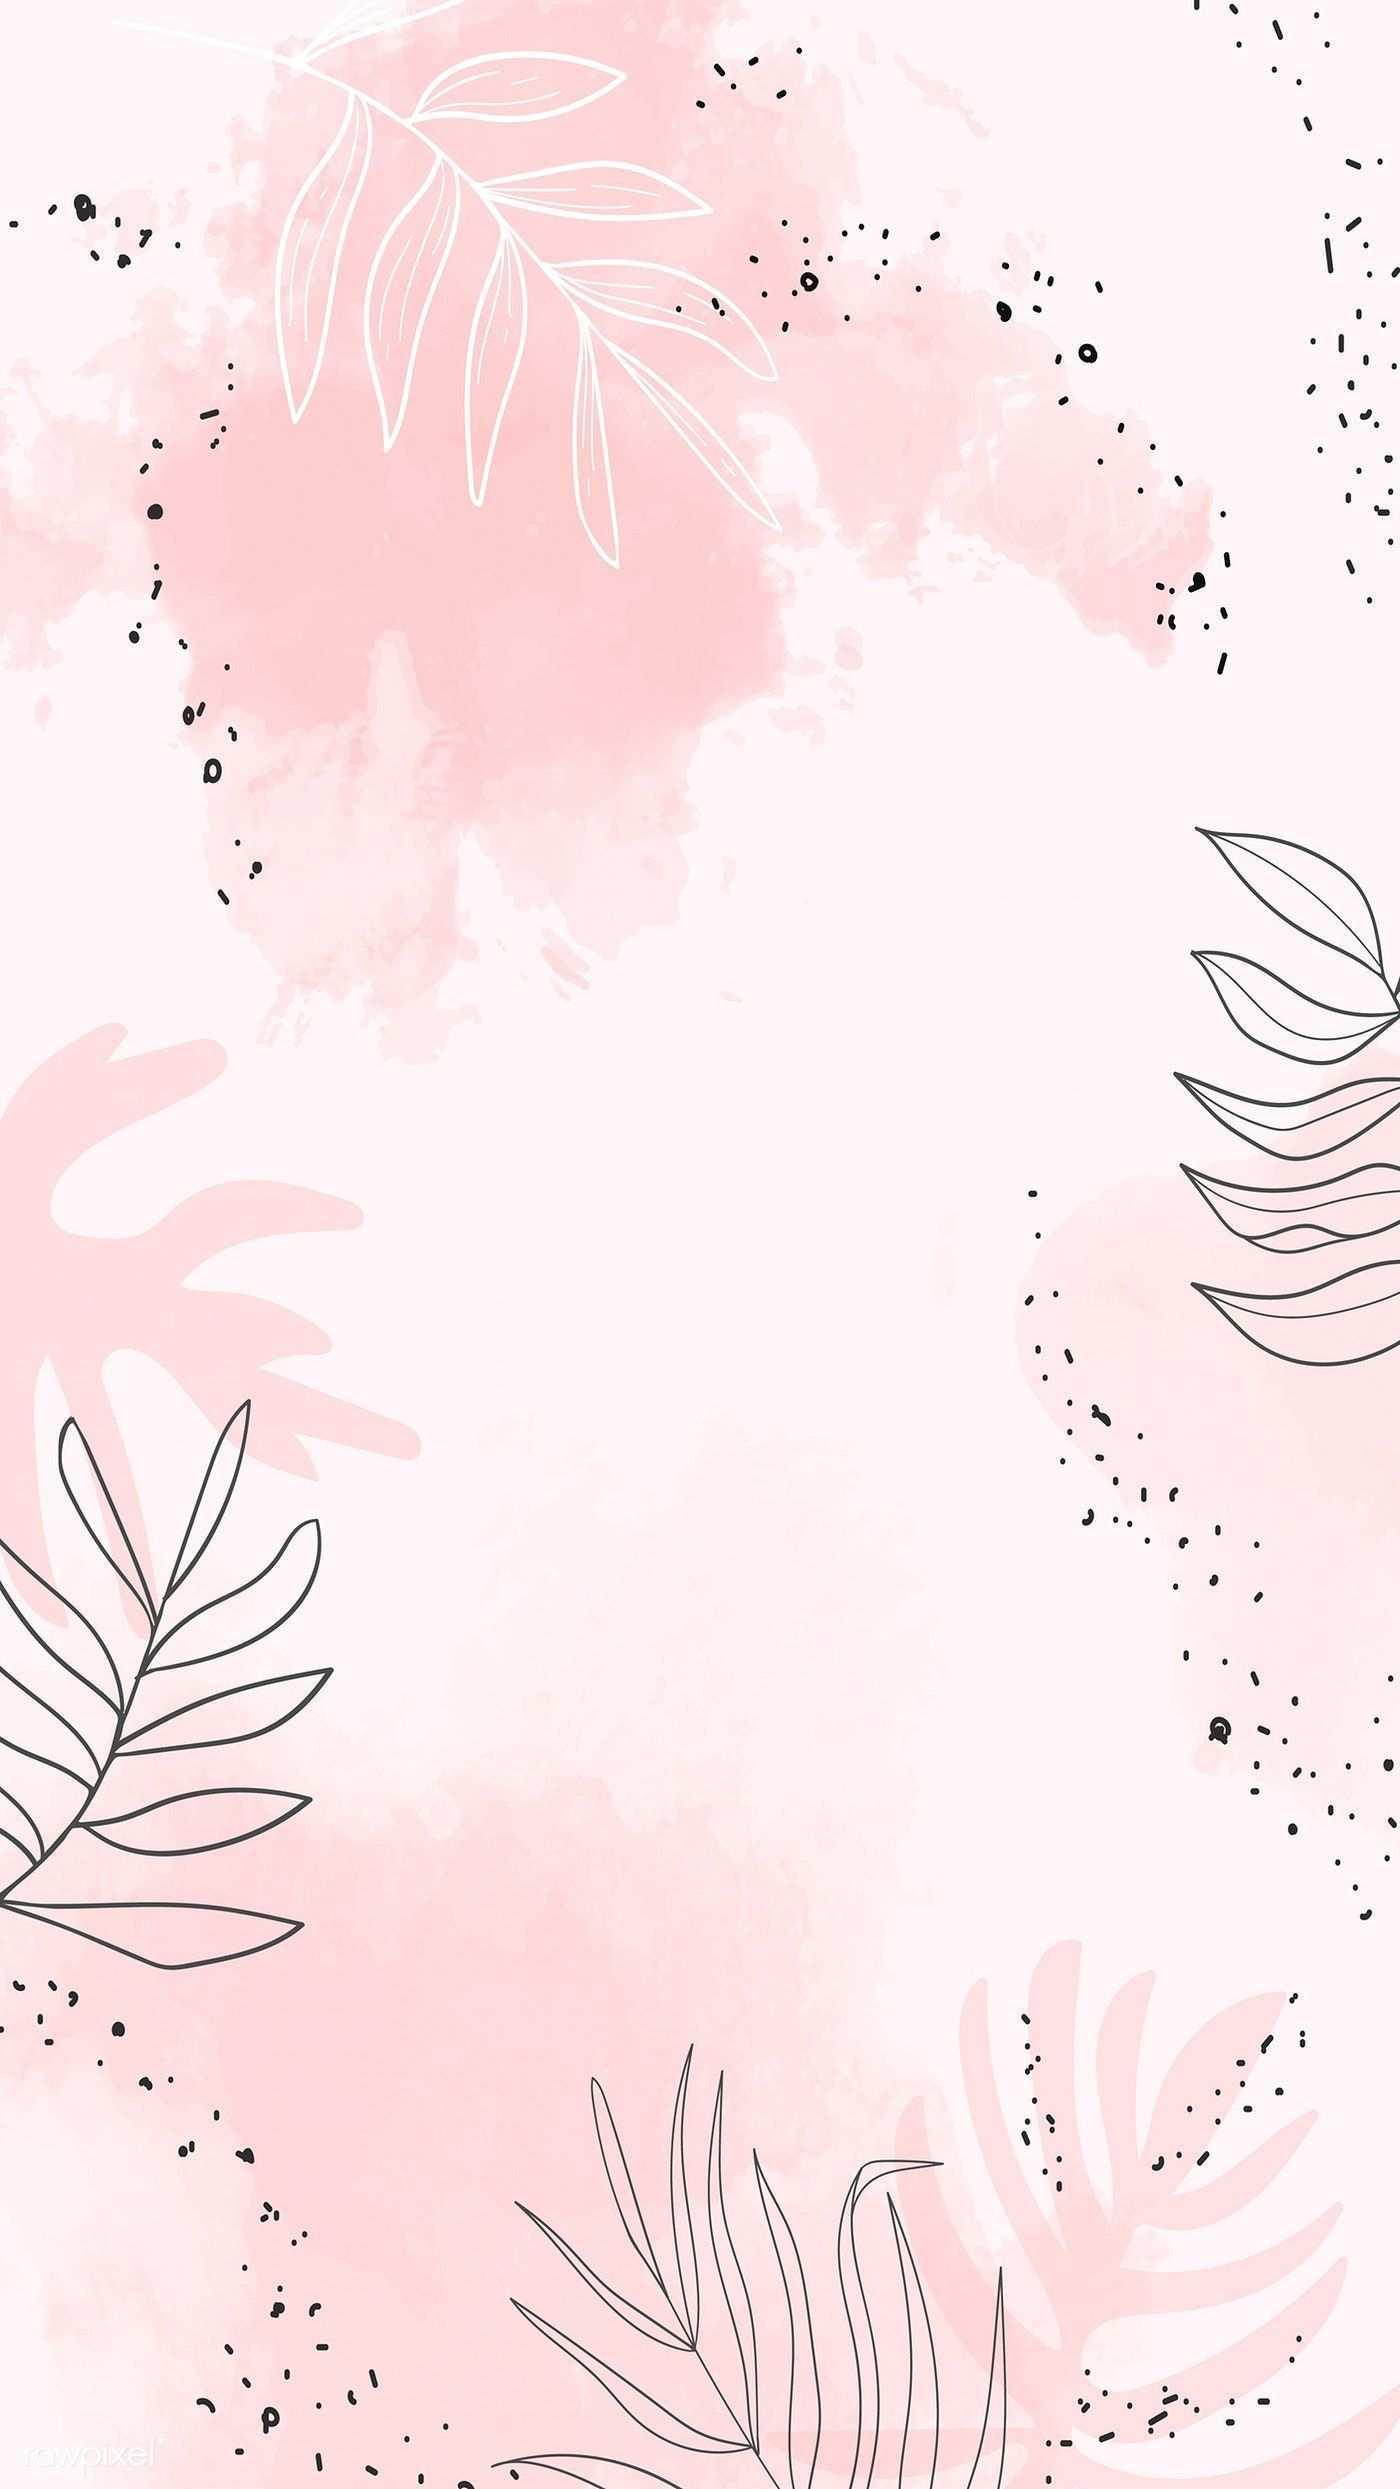 Download Premium Vektor Von Pink Blatt Aquarell Handy Wallpaper Watercolor Wallpaper Iphone Pastel Background Wallpapers Phone Wallpaper Pink